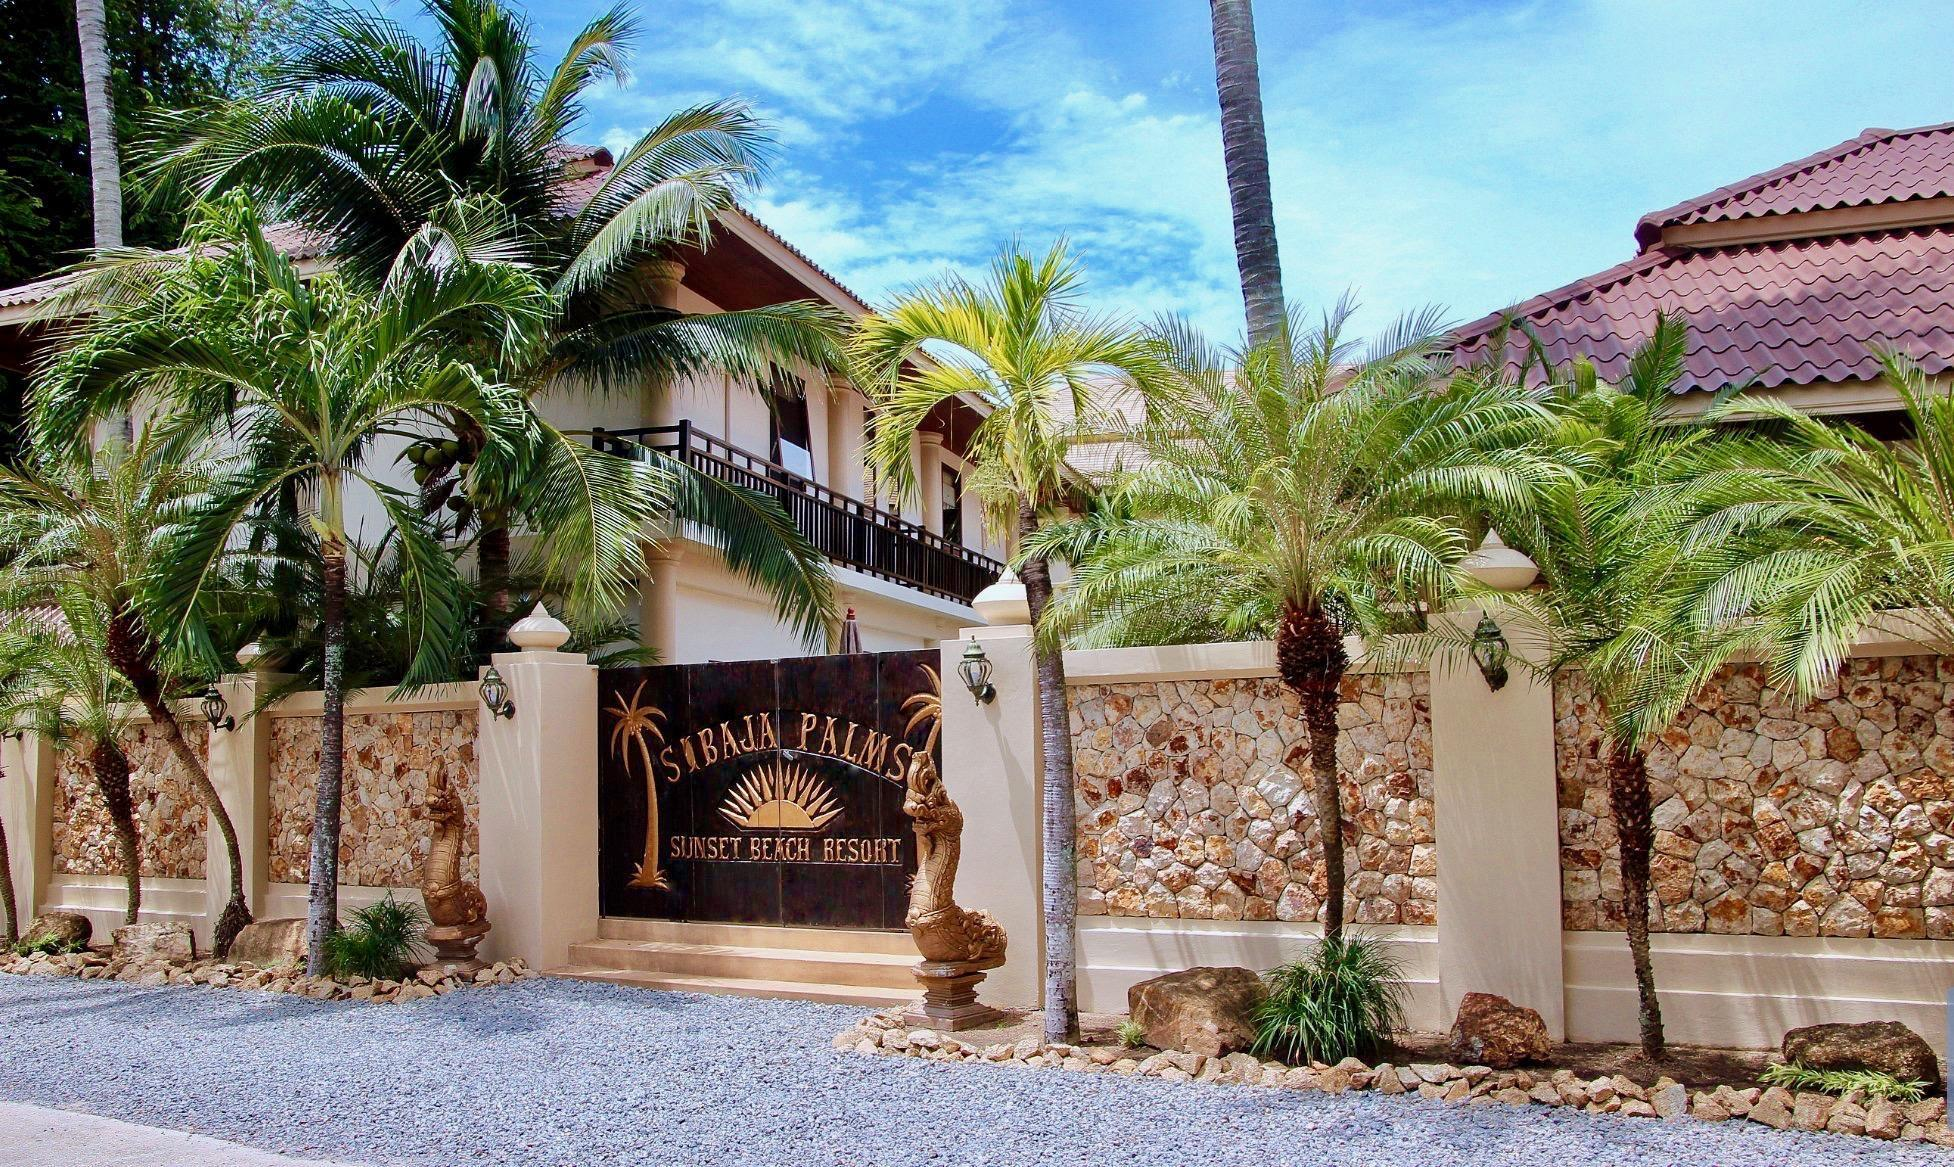 Sibaja Palms Sunset Beach Luxury Villa. สิบาจา ปาล์มส์ ซันเซต บีช ลักชัวรี วิลลา